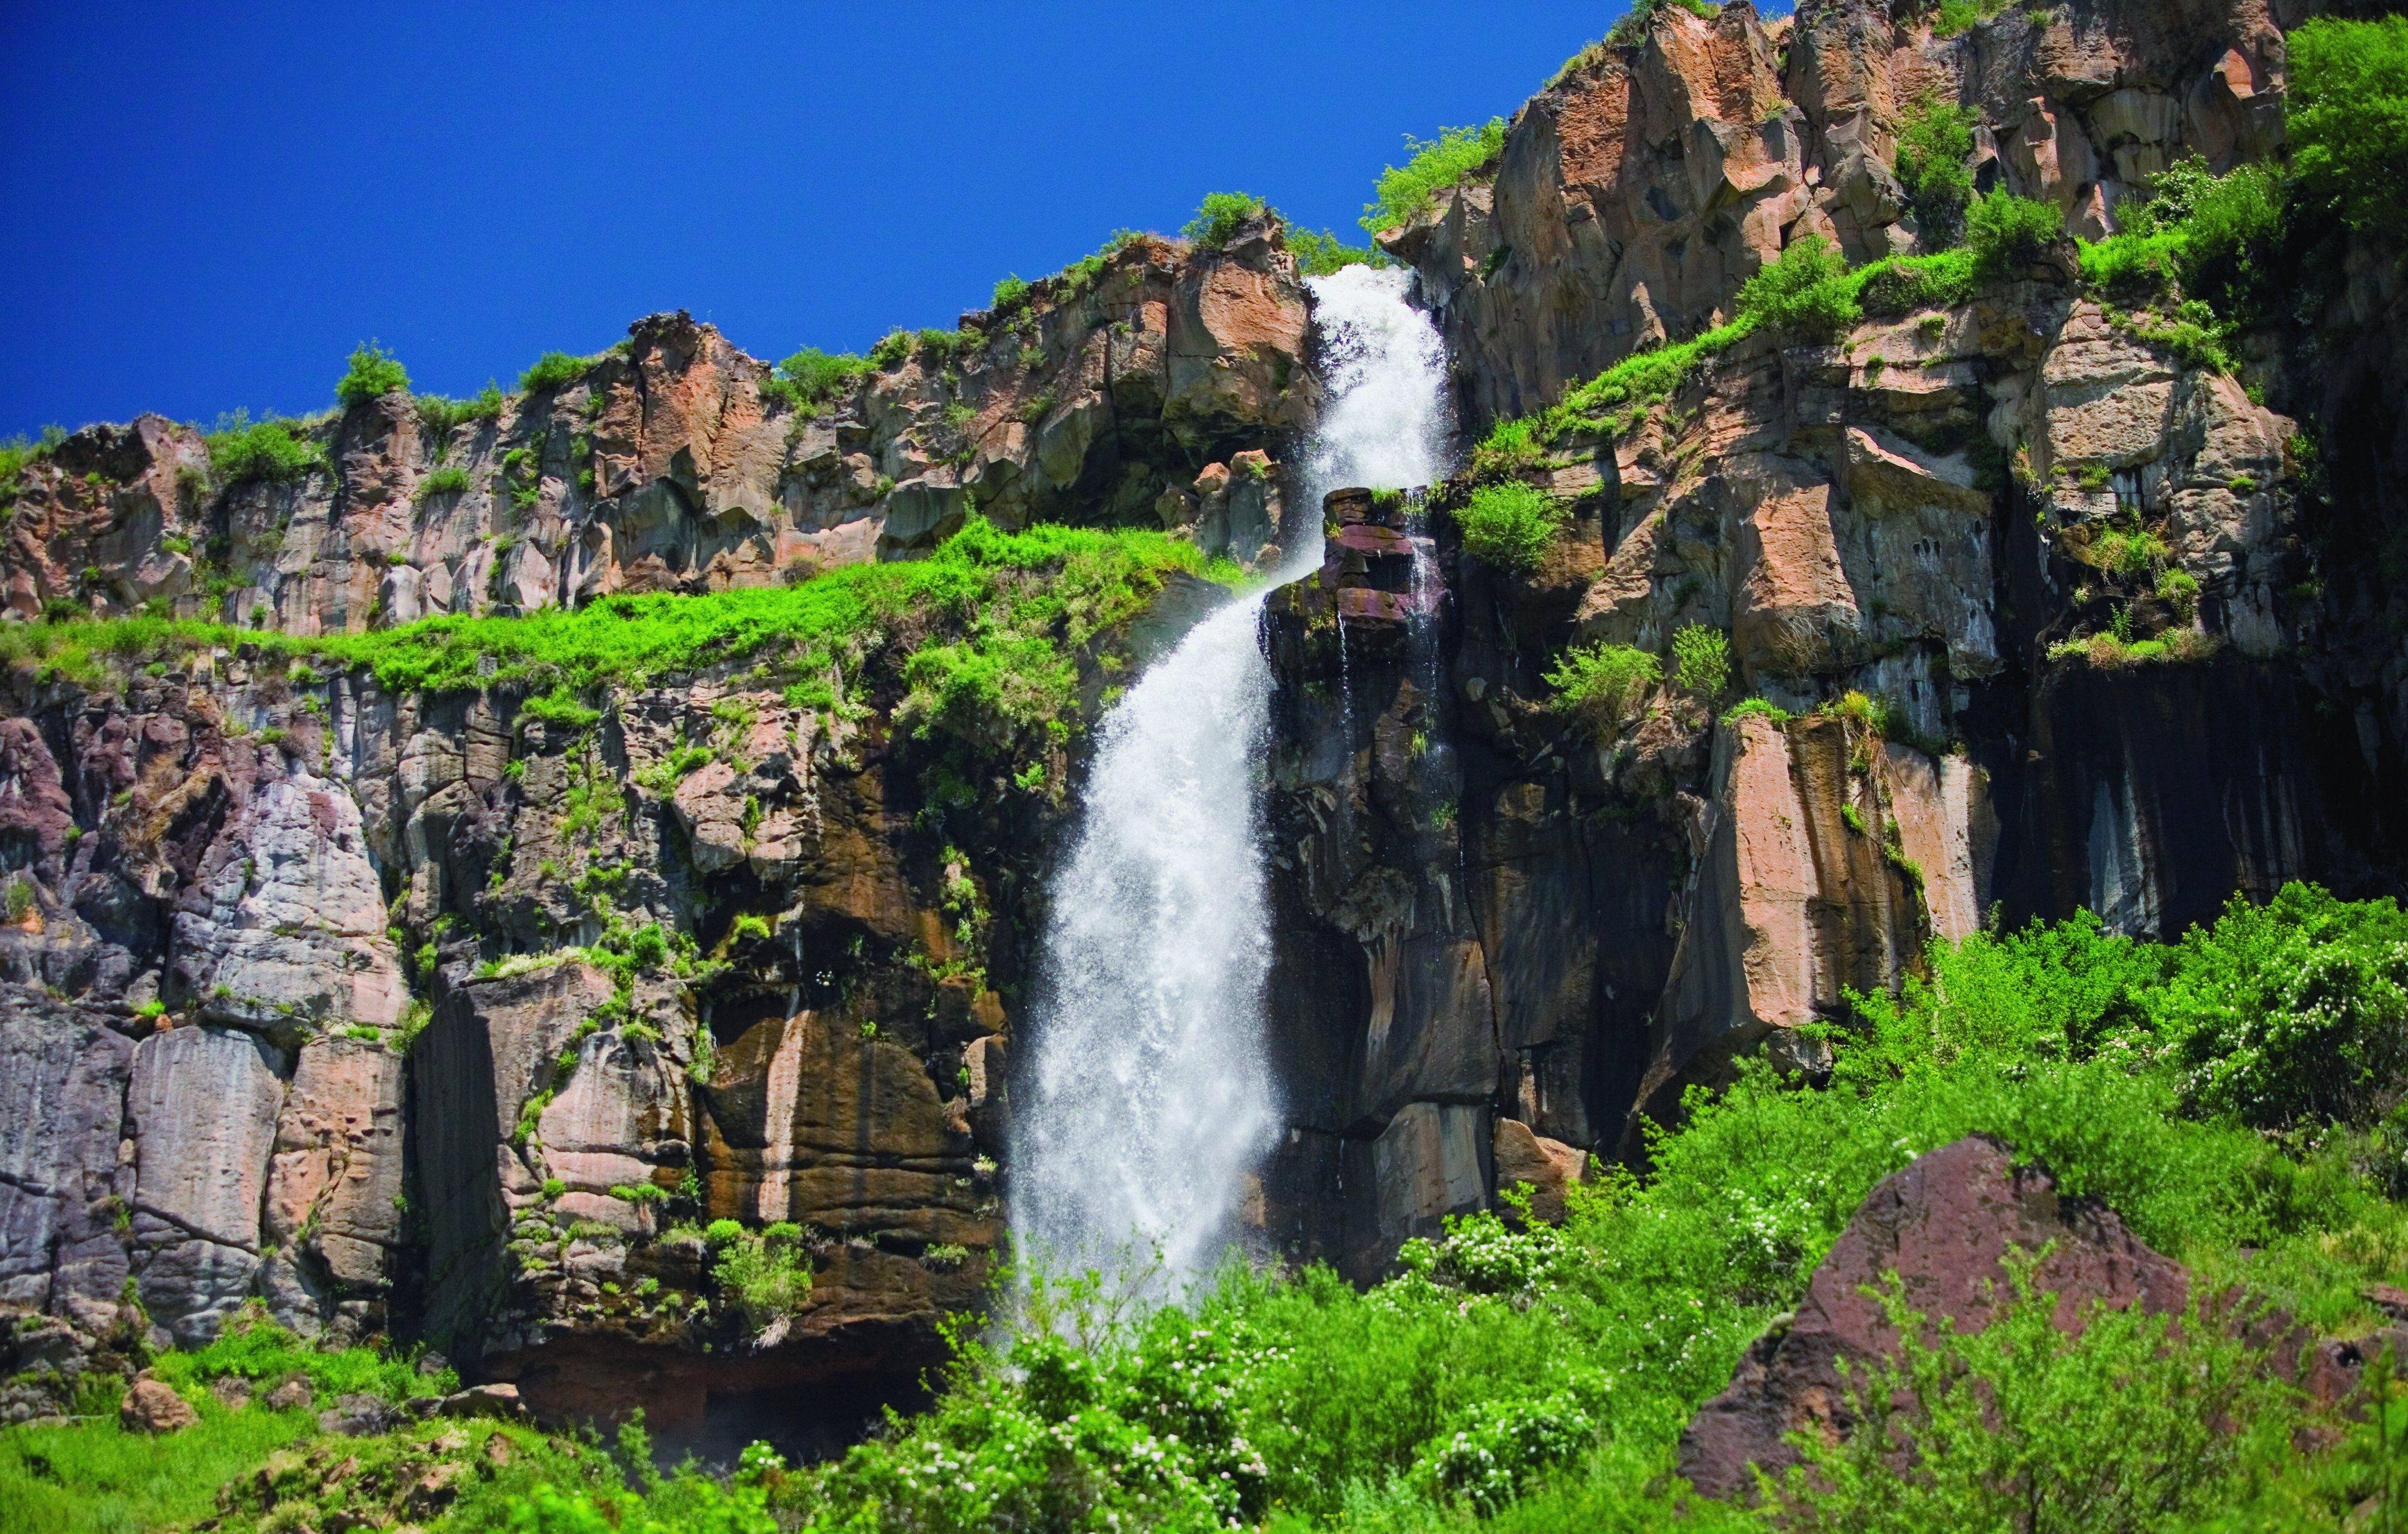 касахский водопад, Армения